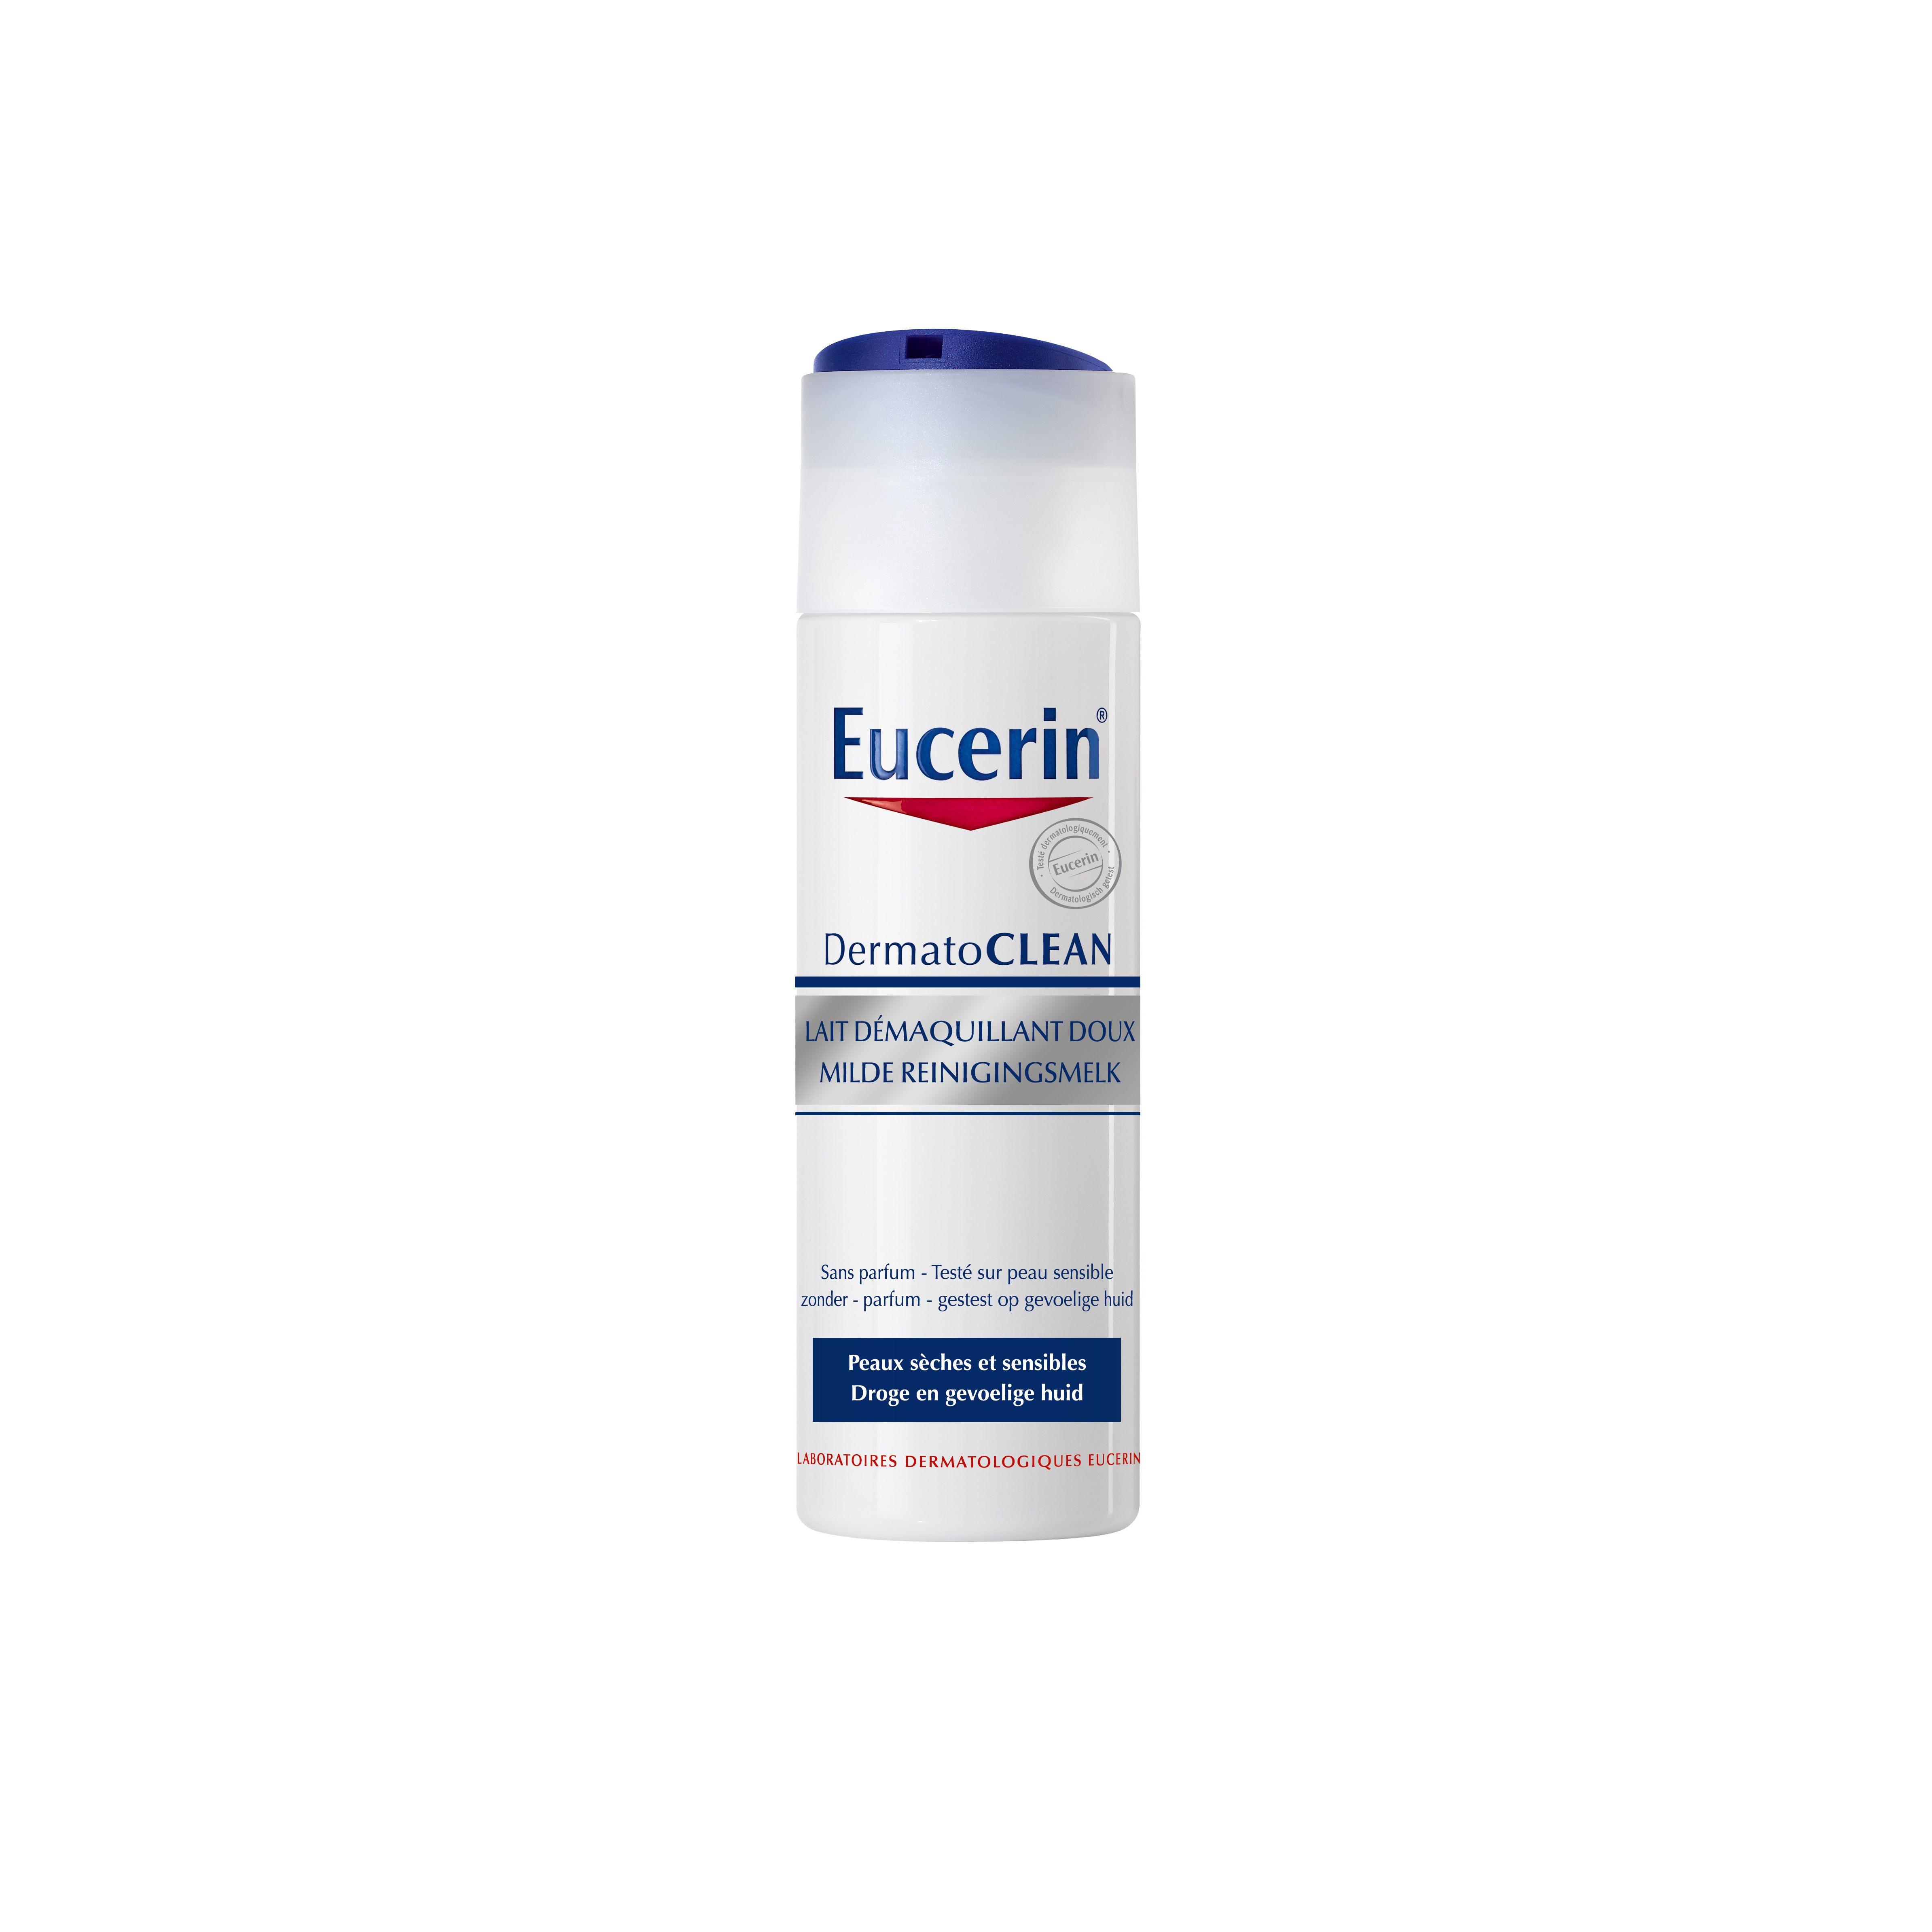 Eucerin Dermatoclean Melk 200ml